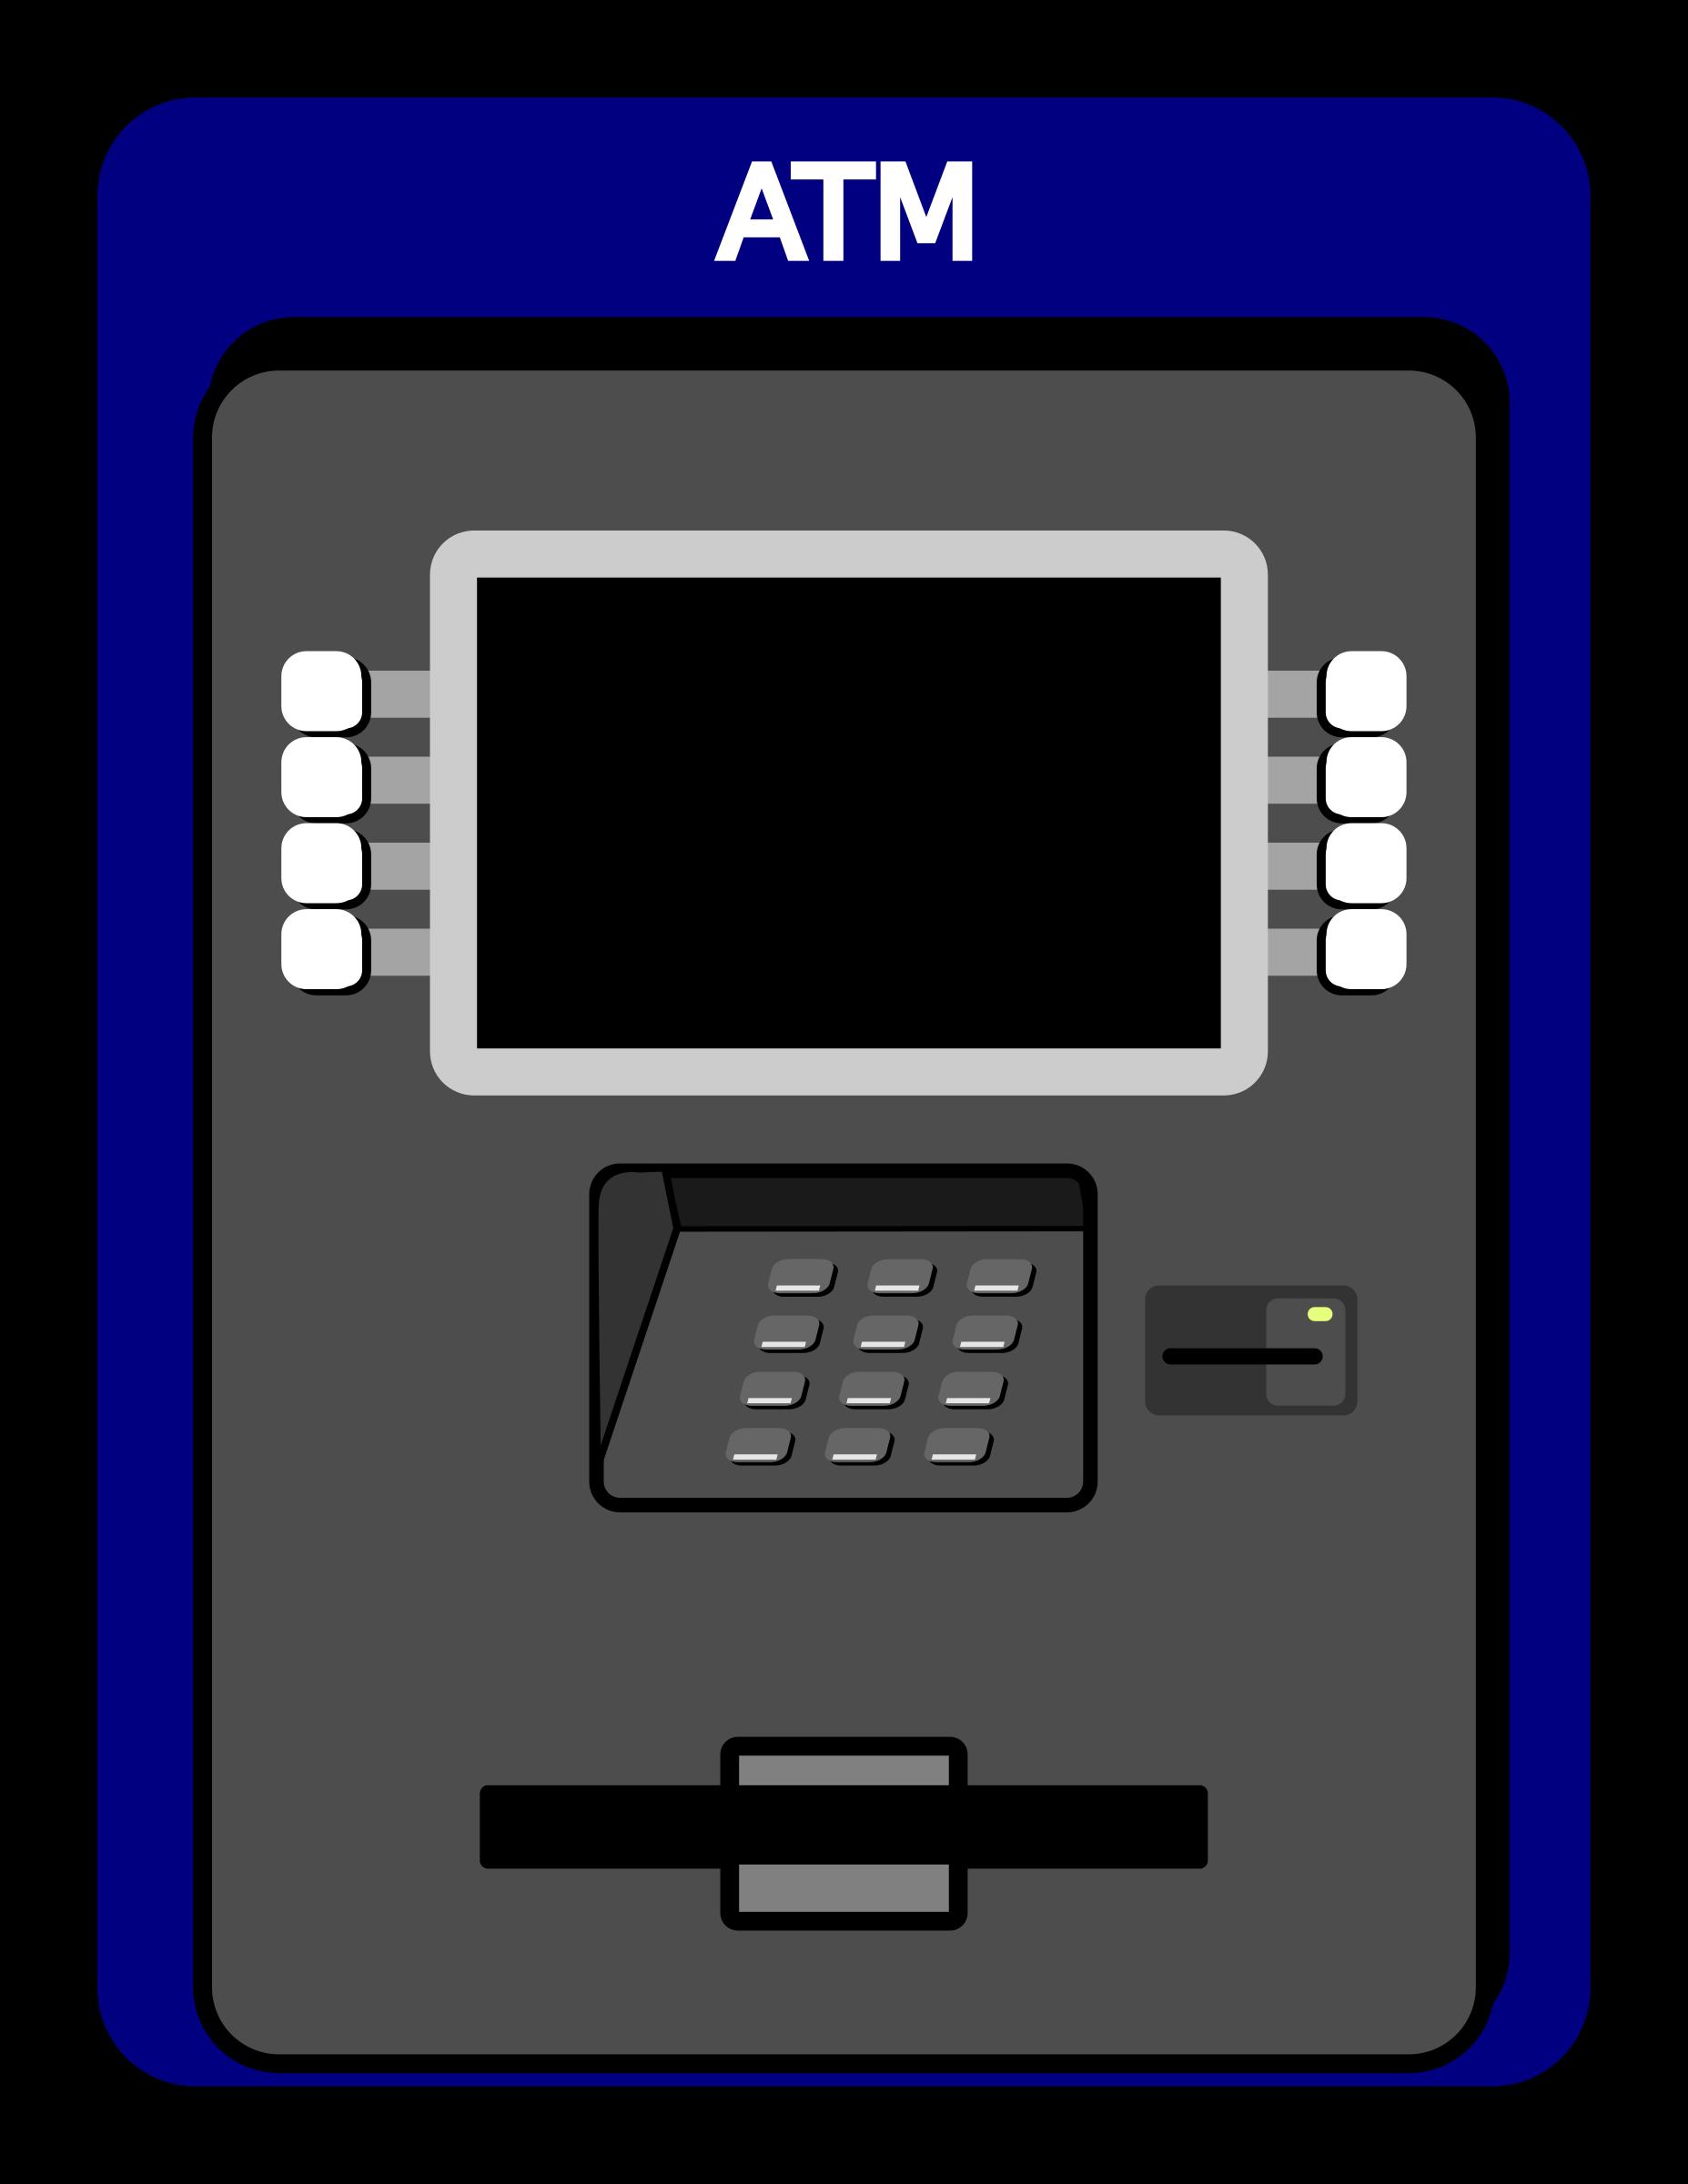 Clipart atm machine.